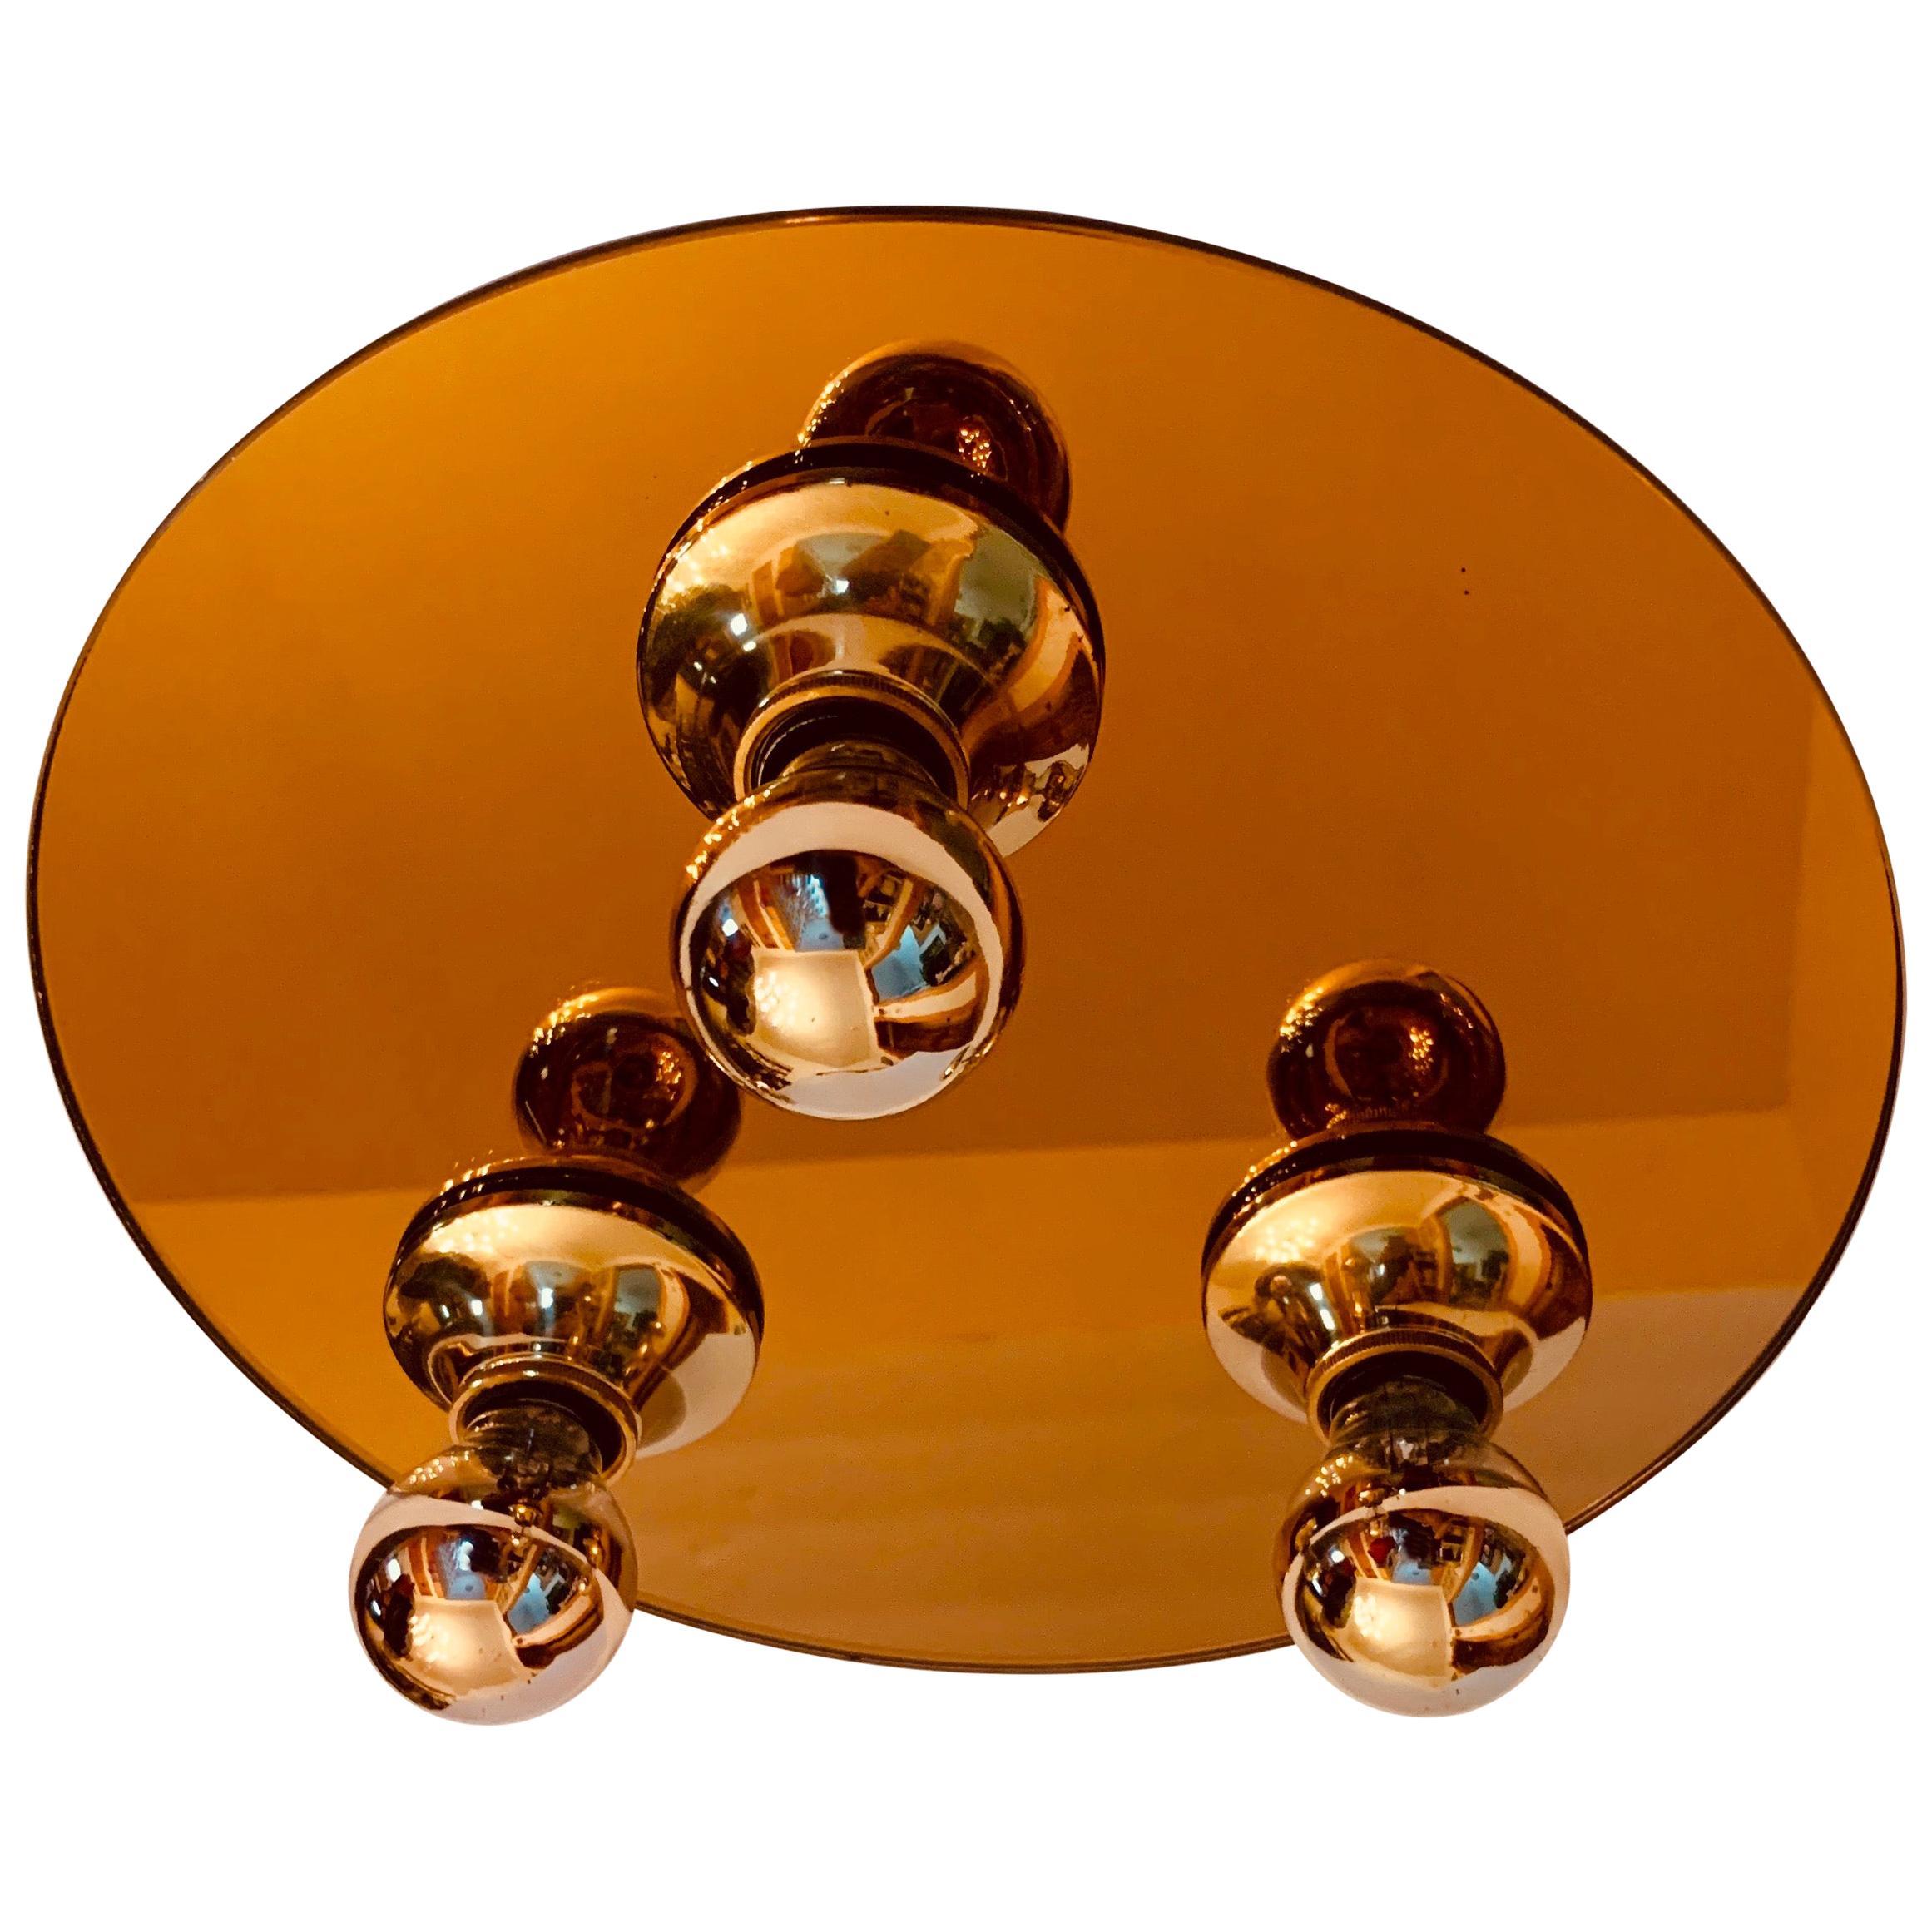 1960s Space Age Modernist Flush Light